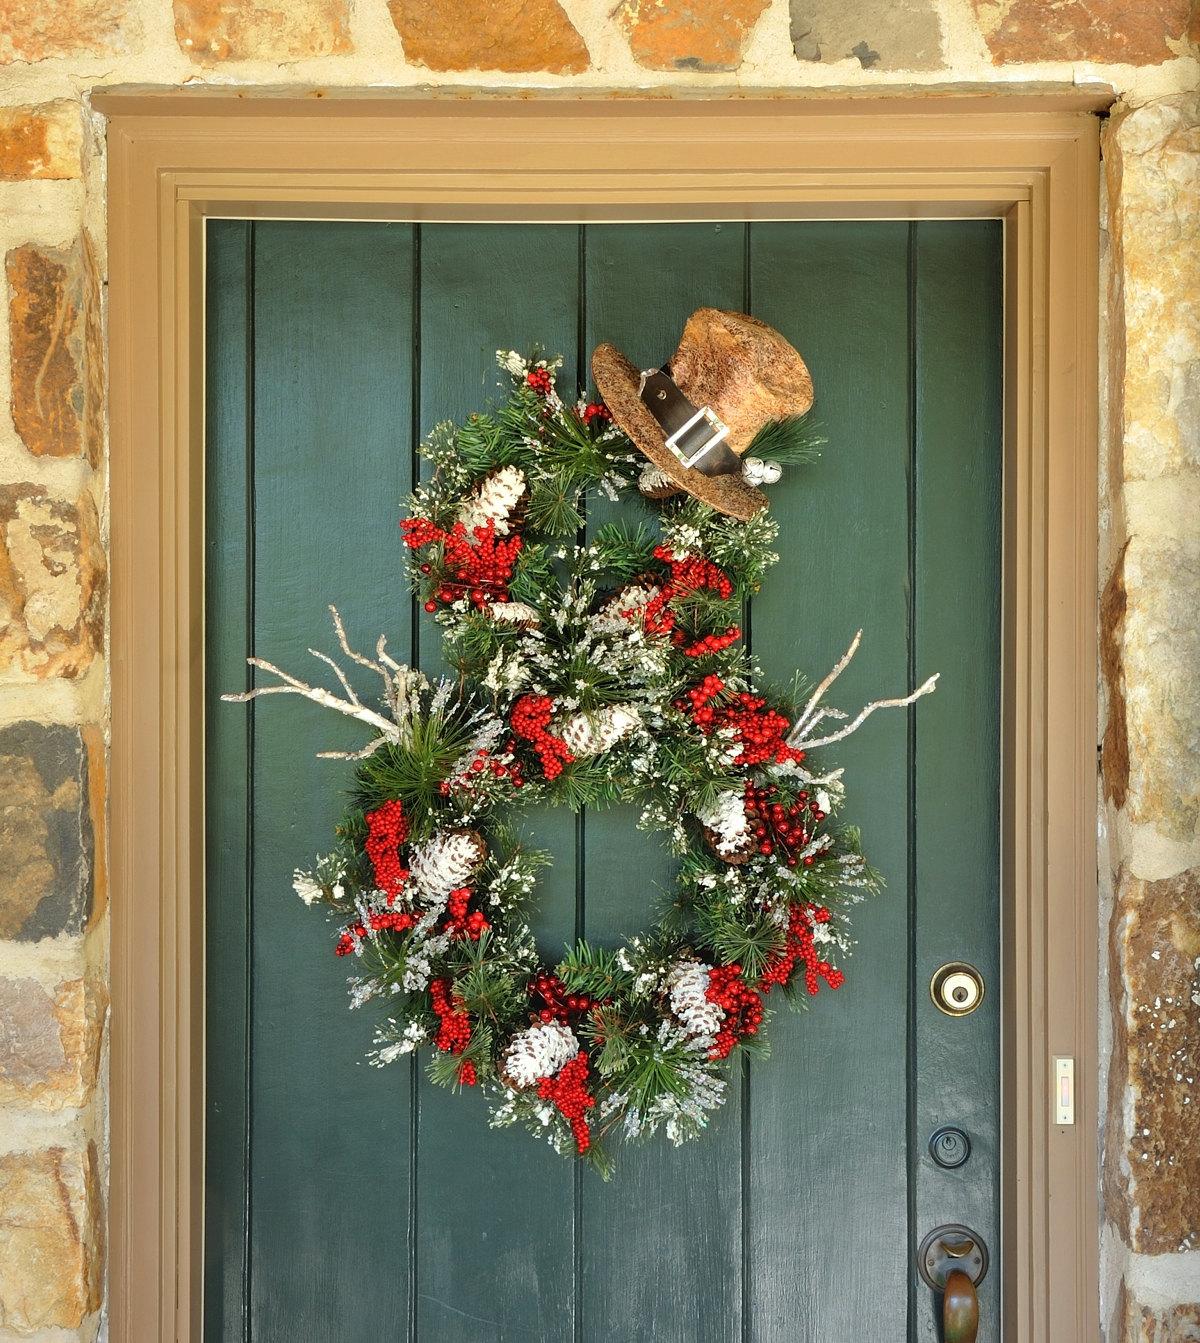 18 Chilly Handmade Winter Wreath Designs For Your Front Door